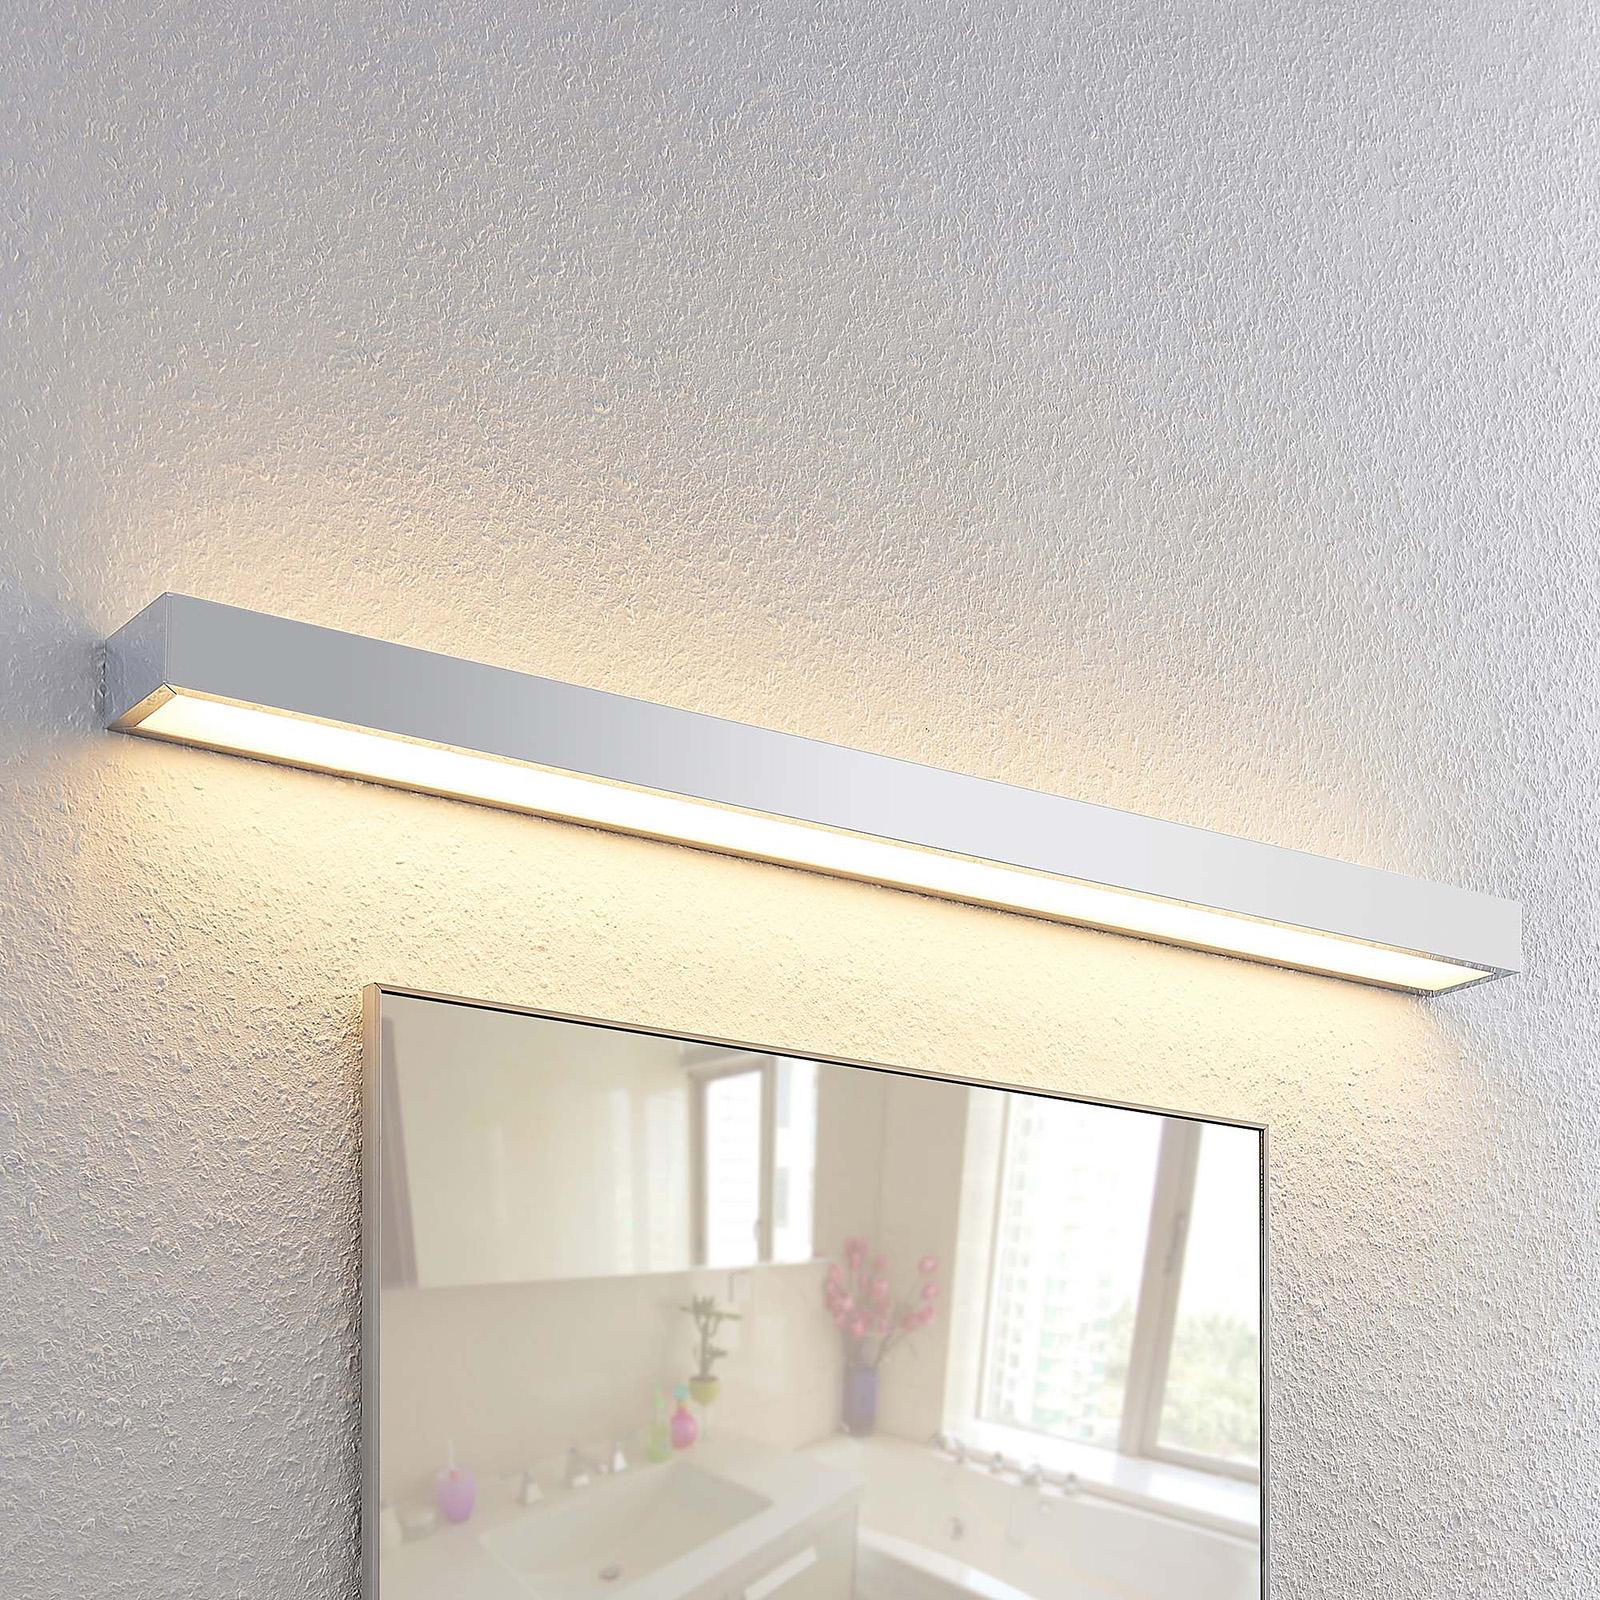 Lindby Layan LED-Bad-Wandleuchte, chrom, 90 cm